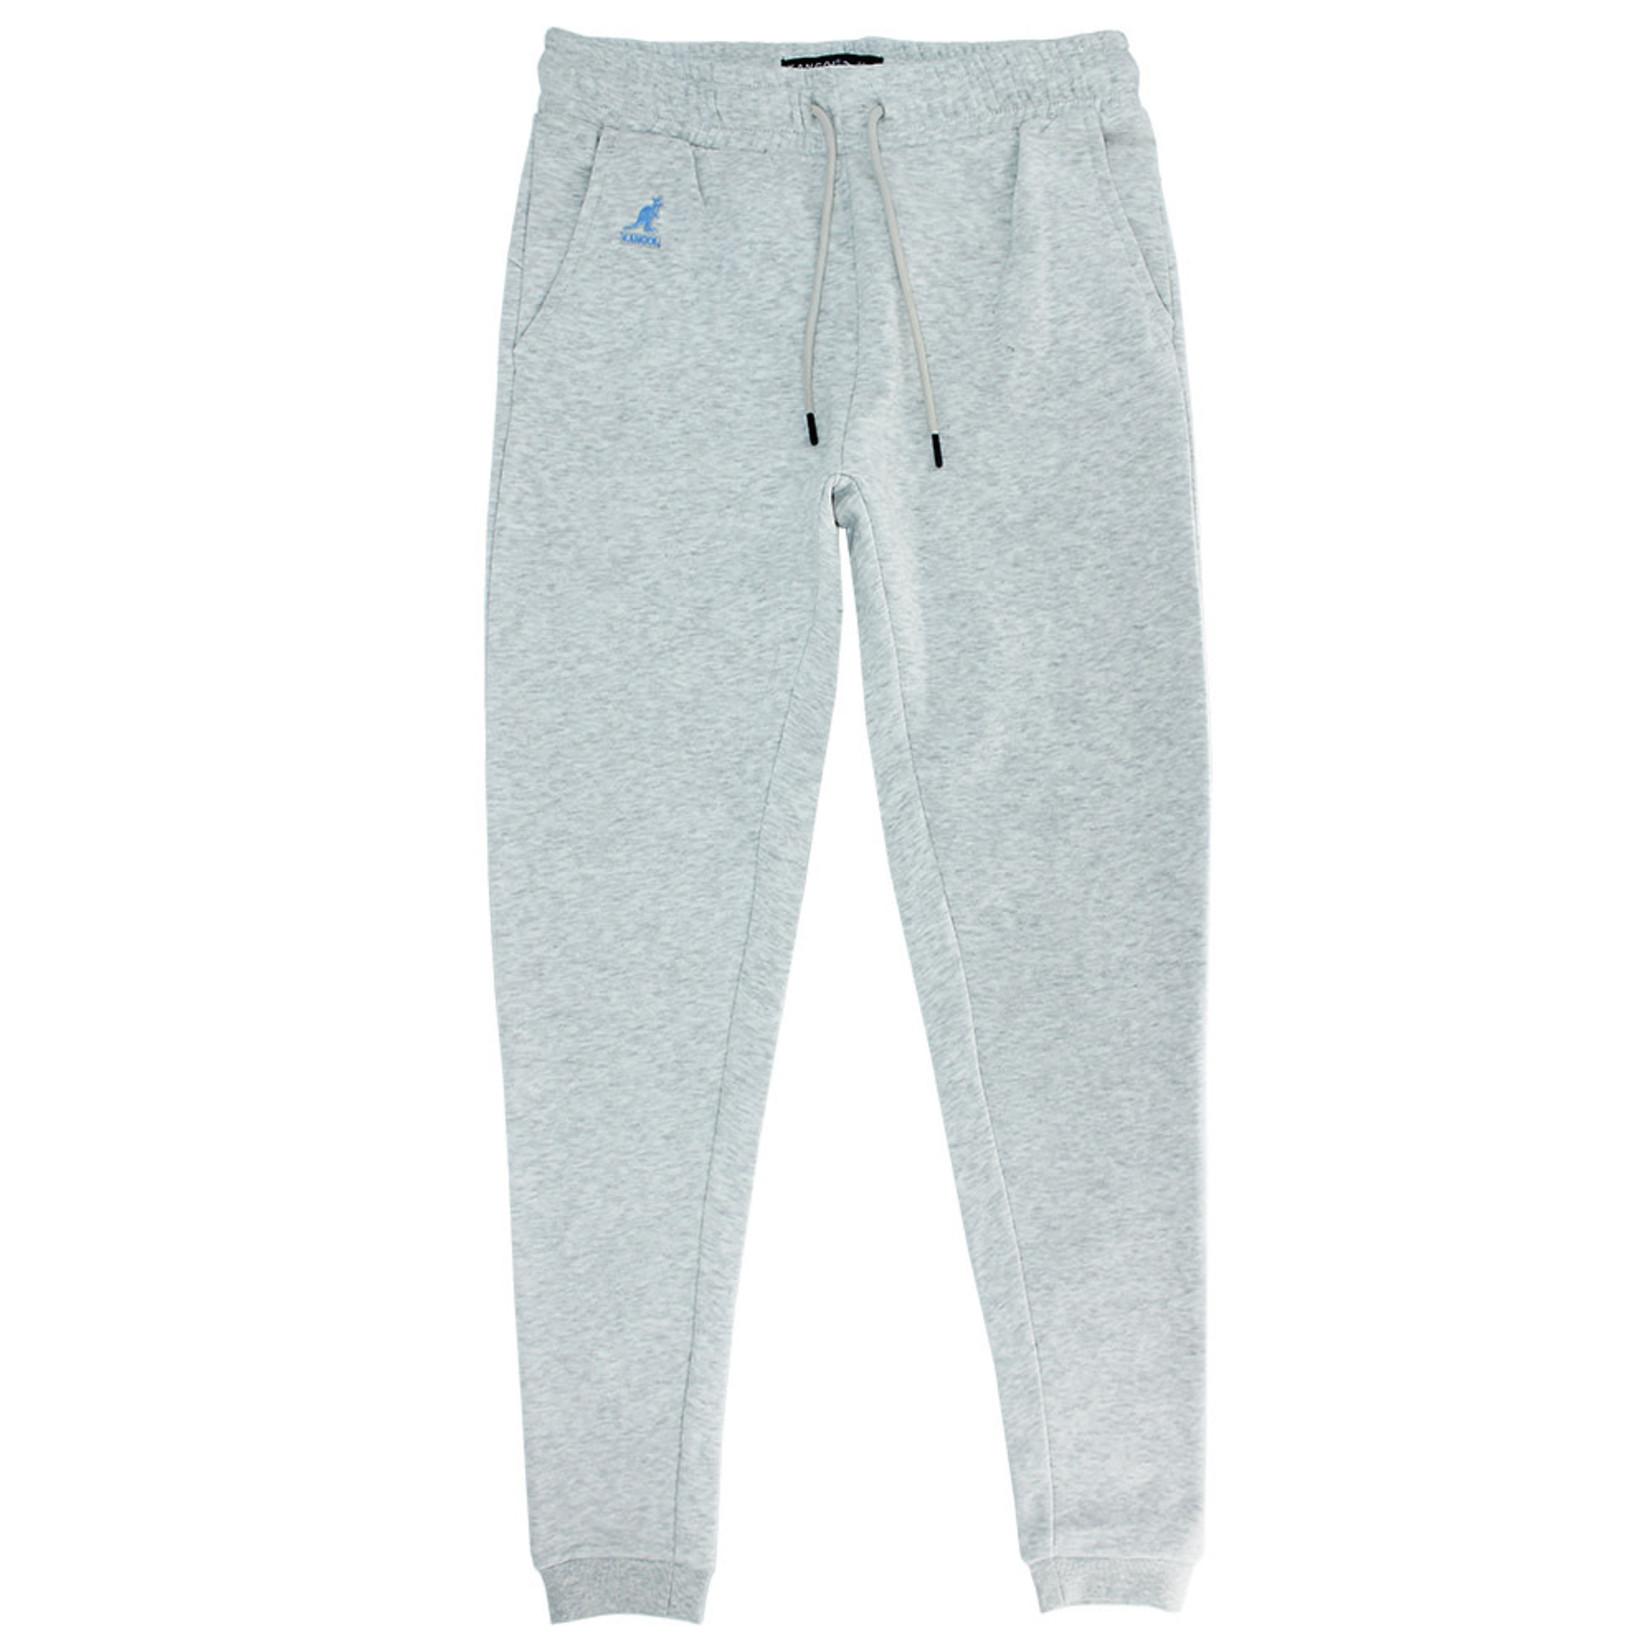 Kangol Kangol : Jogger Pants